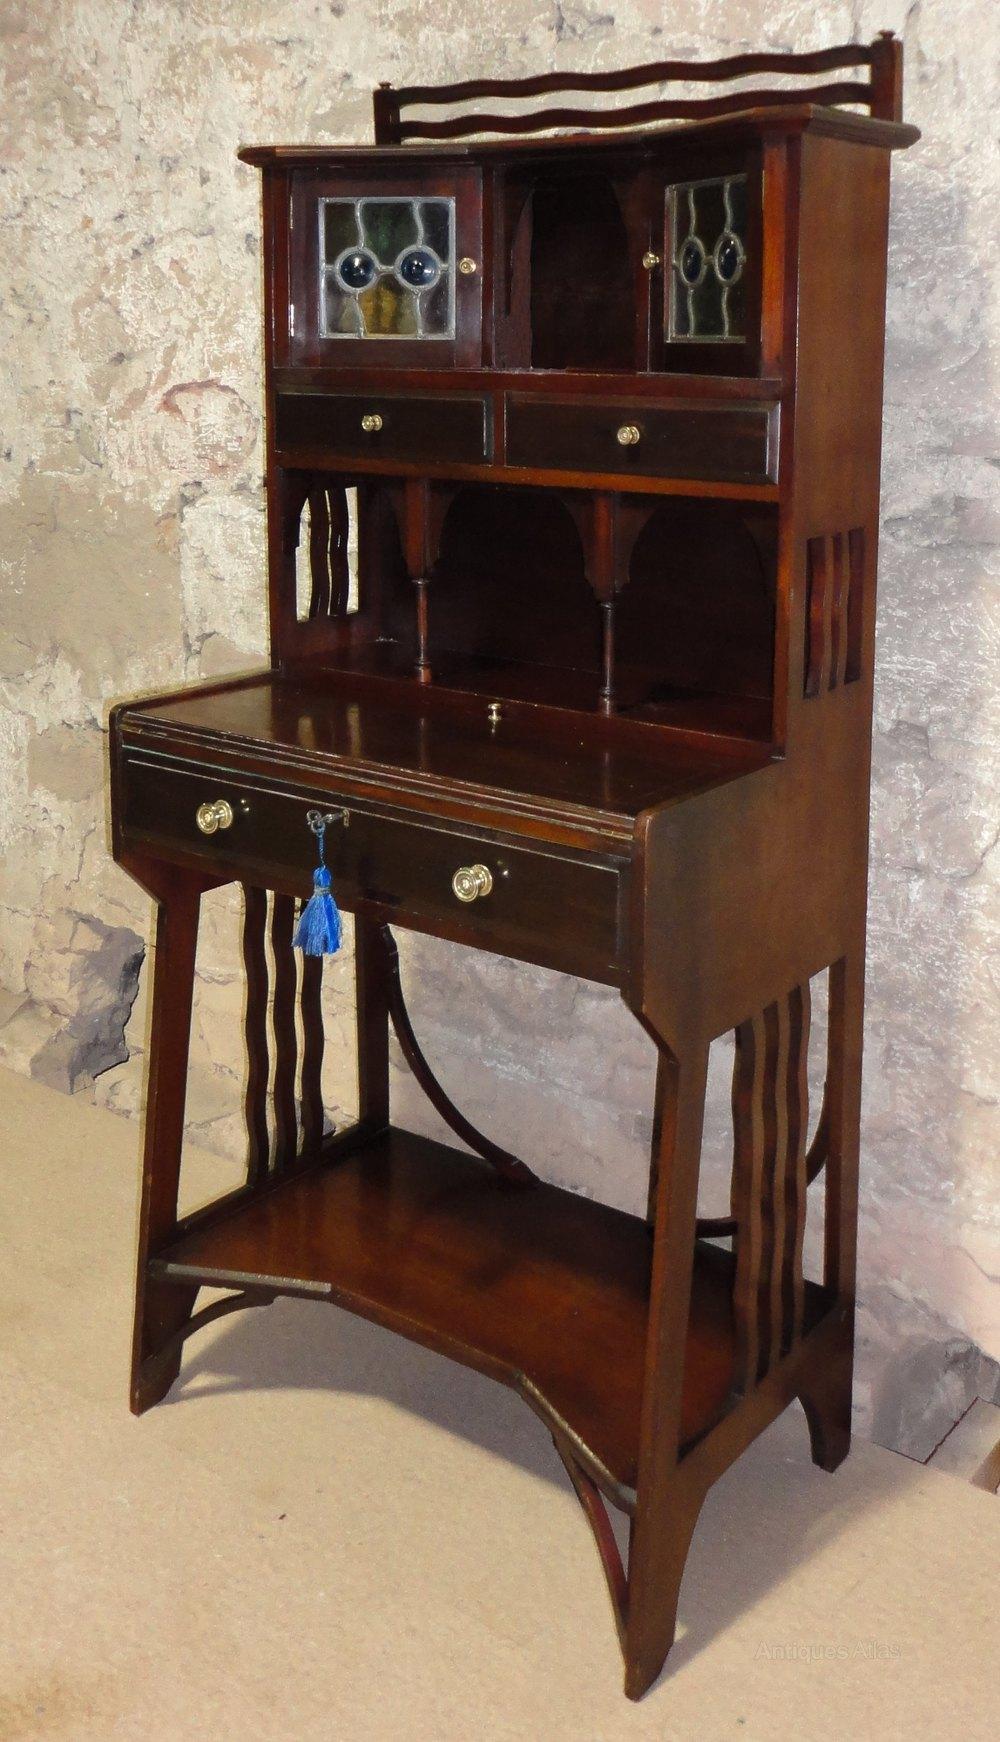 Arts crafts desk - Antique Arts And Crafts Desk Arts And Crafts Writing Desk Liberty Arts Crafts Mahogany Writing